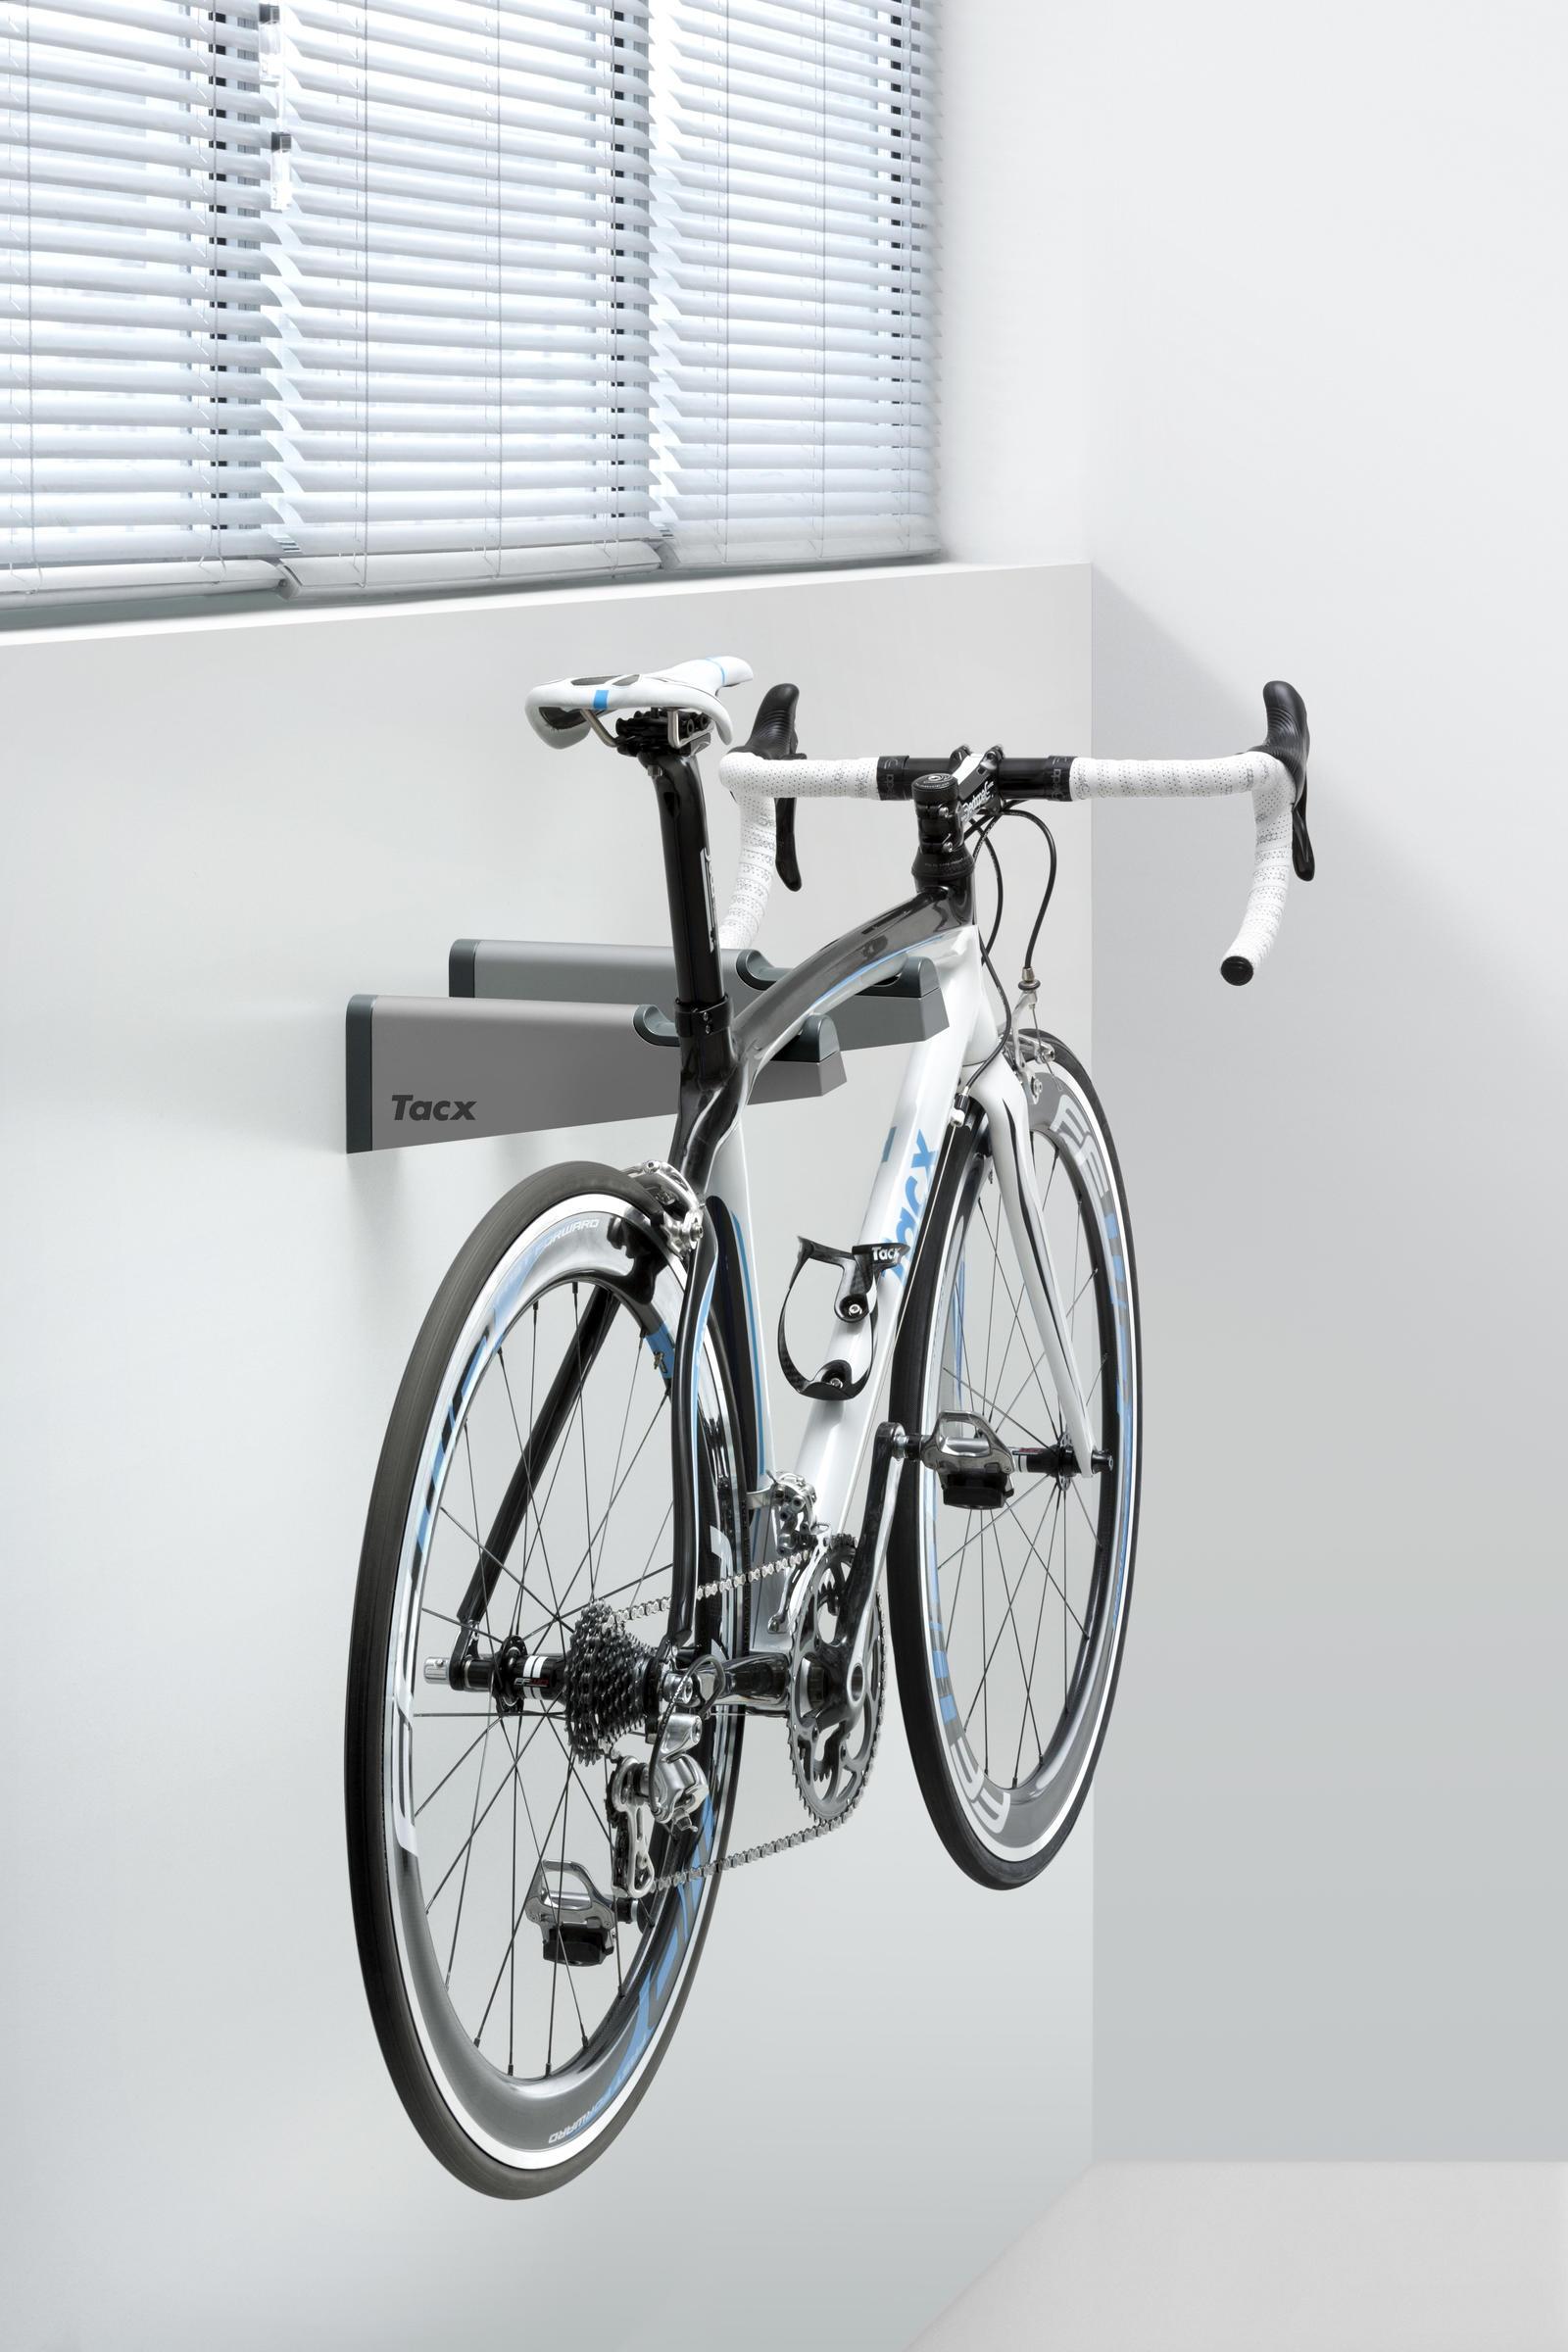 Tacx Gem Bikebracket Wall Mount Bike Display Rack